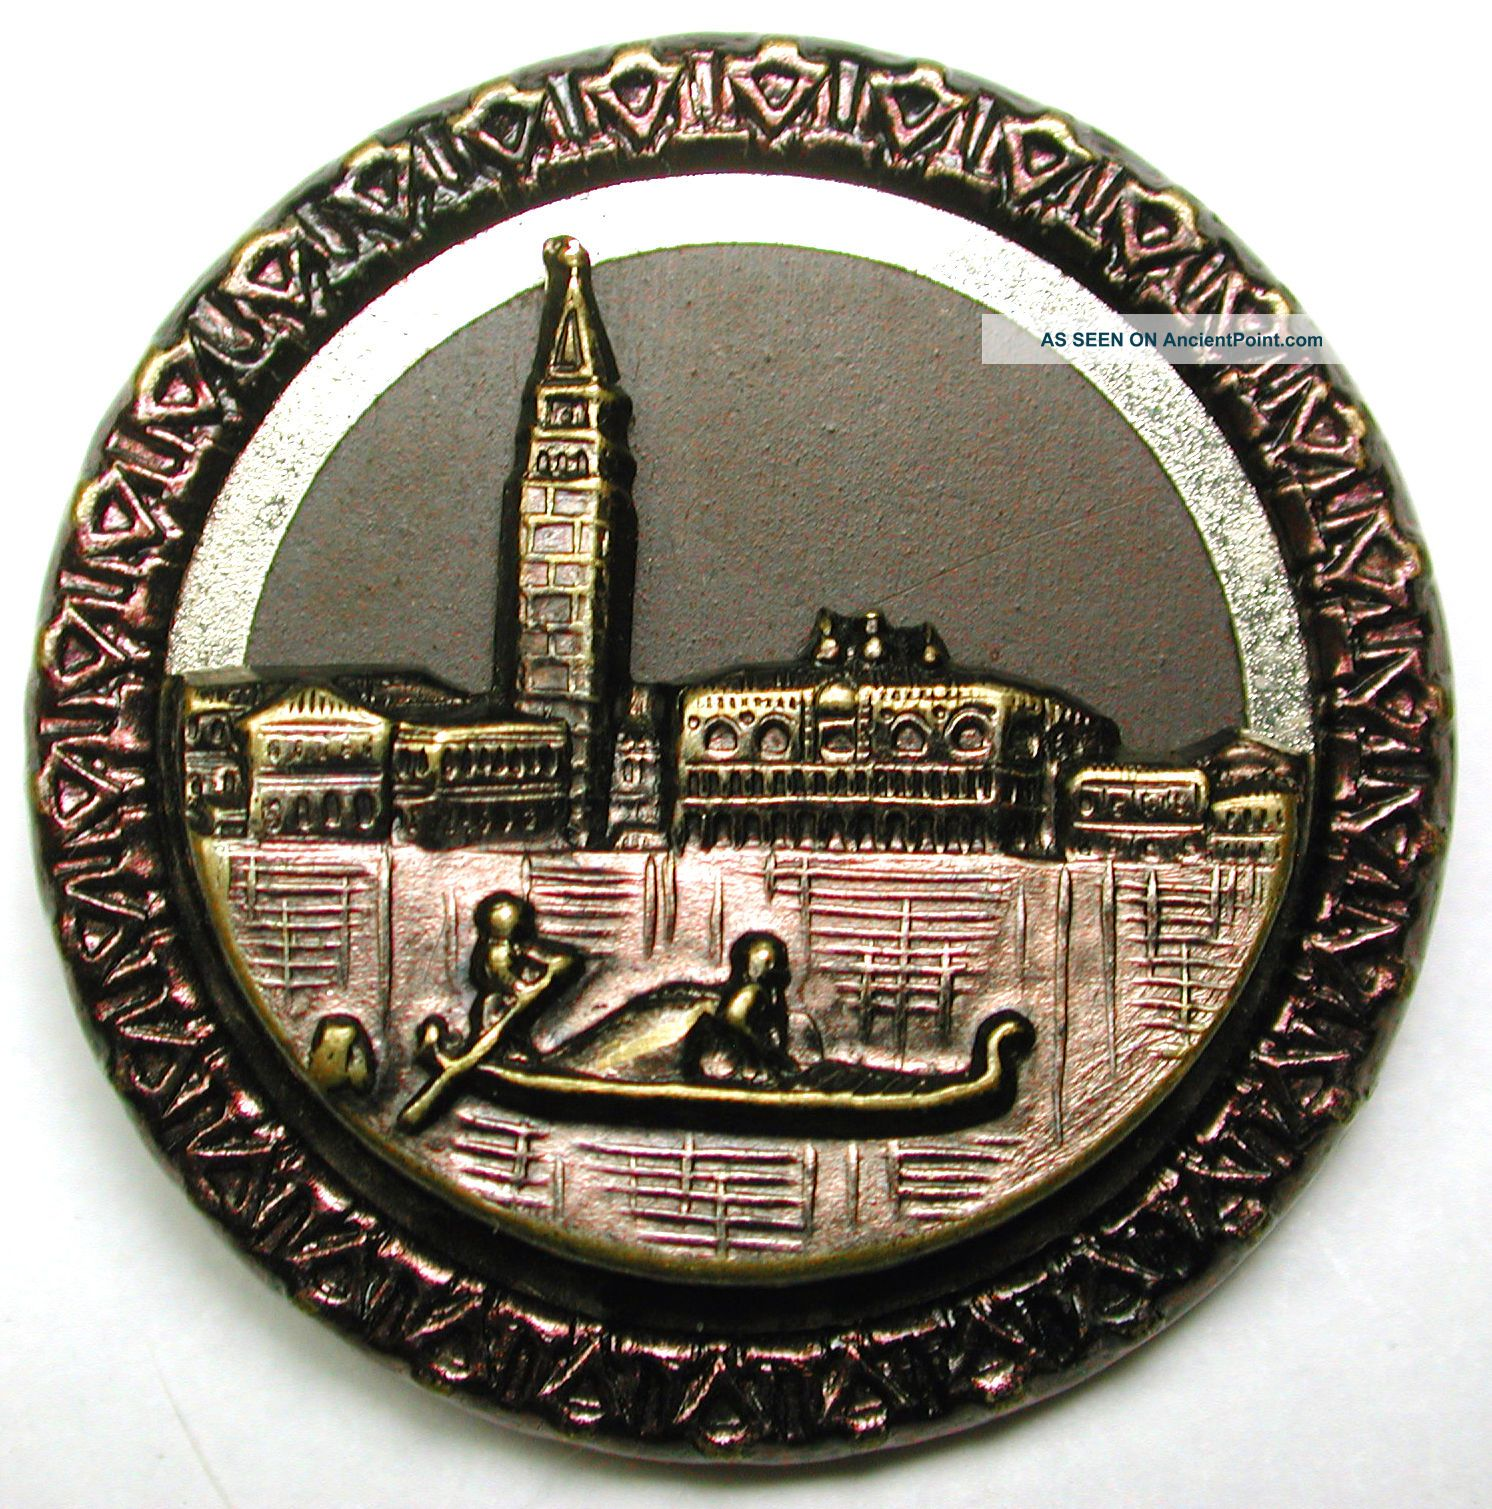 Lg Sz Antique Tinted Brass Button Detailed Gondola & Venice Scene 1 & 7/16